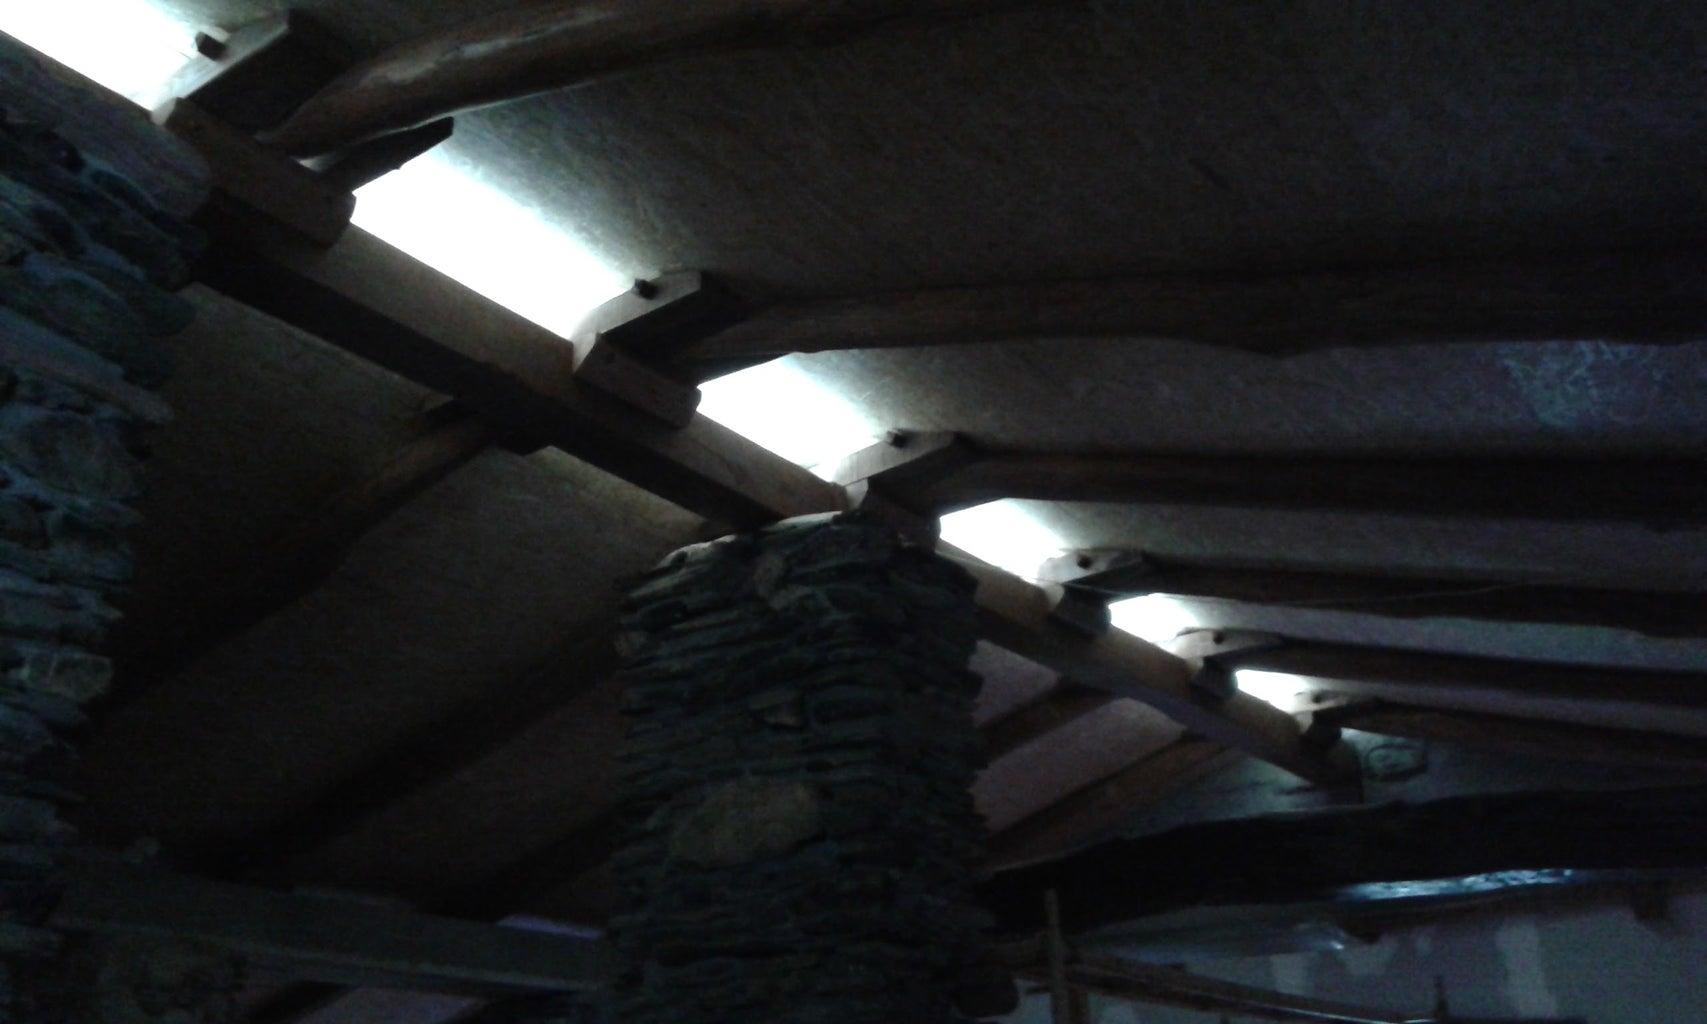 Replacing the Rotten Wood Beams